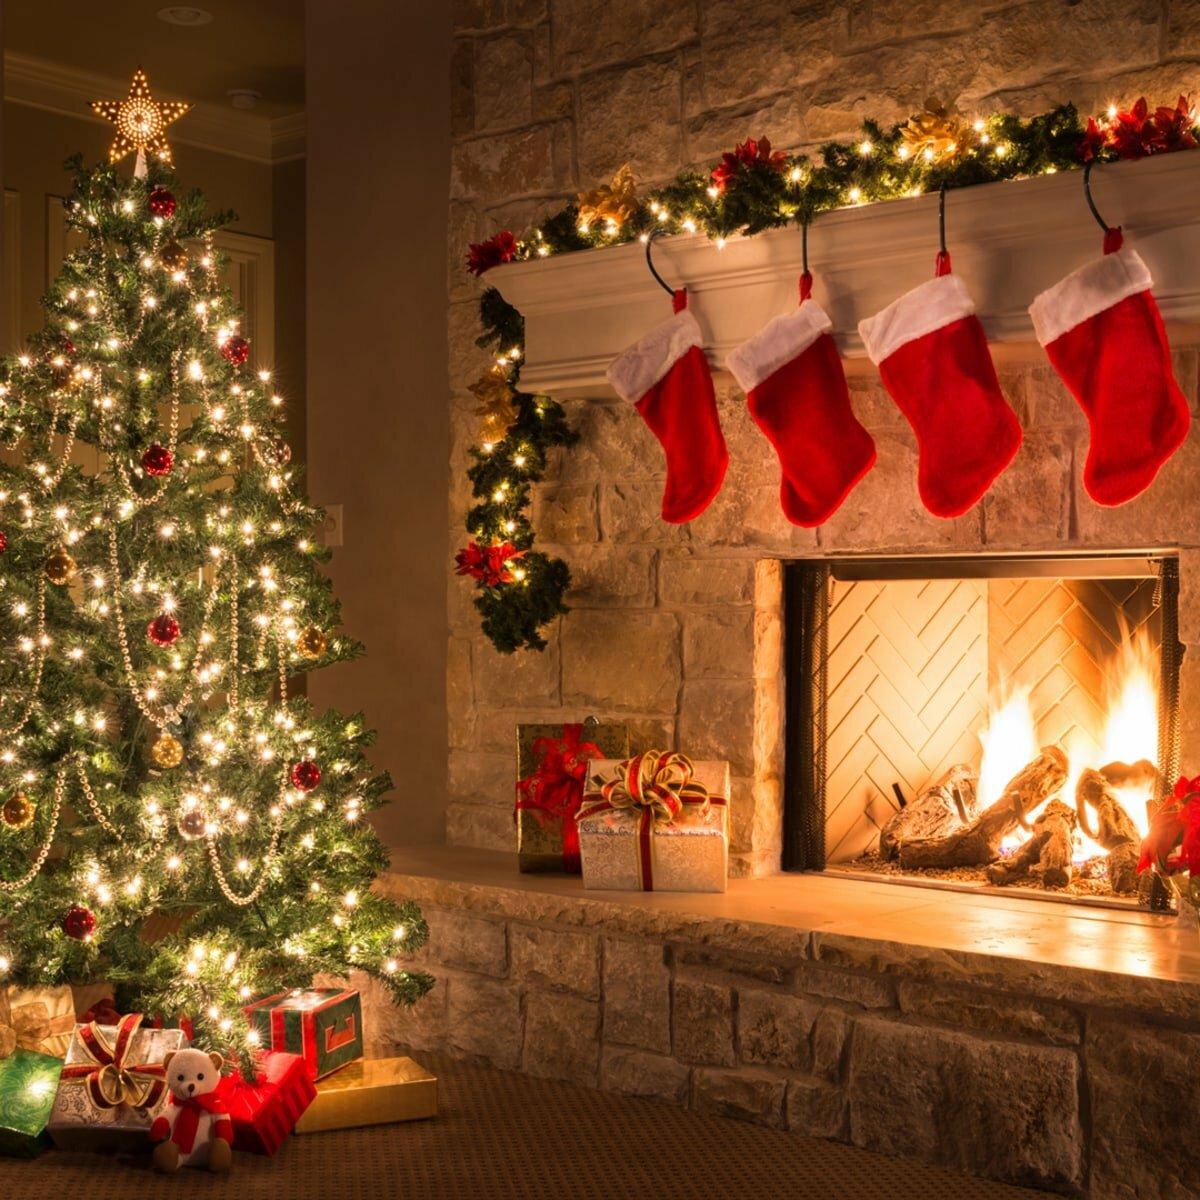 vintage-Christmas-ornaments-2020-1